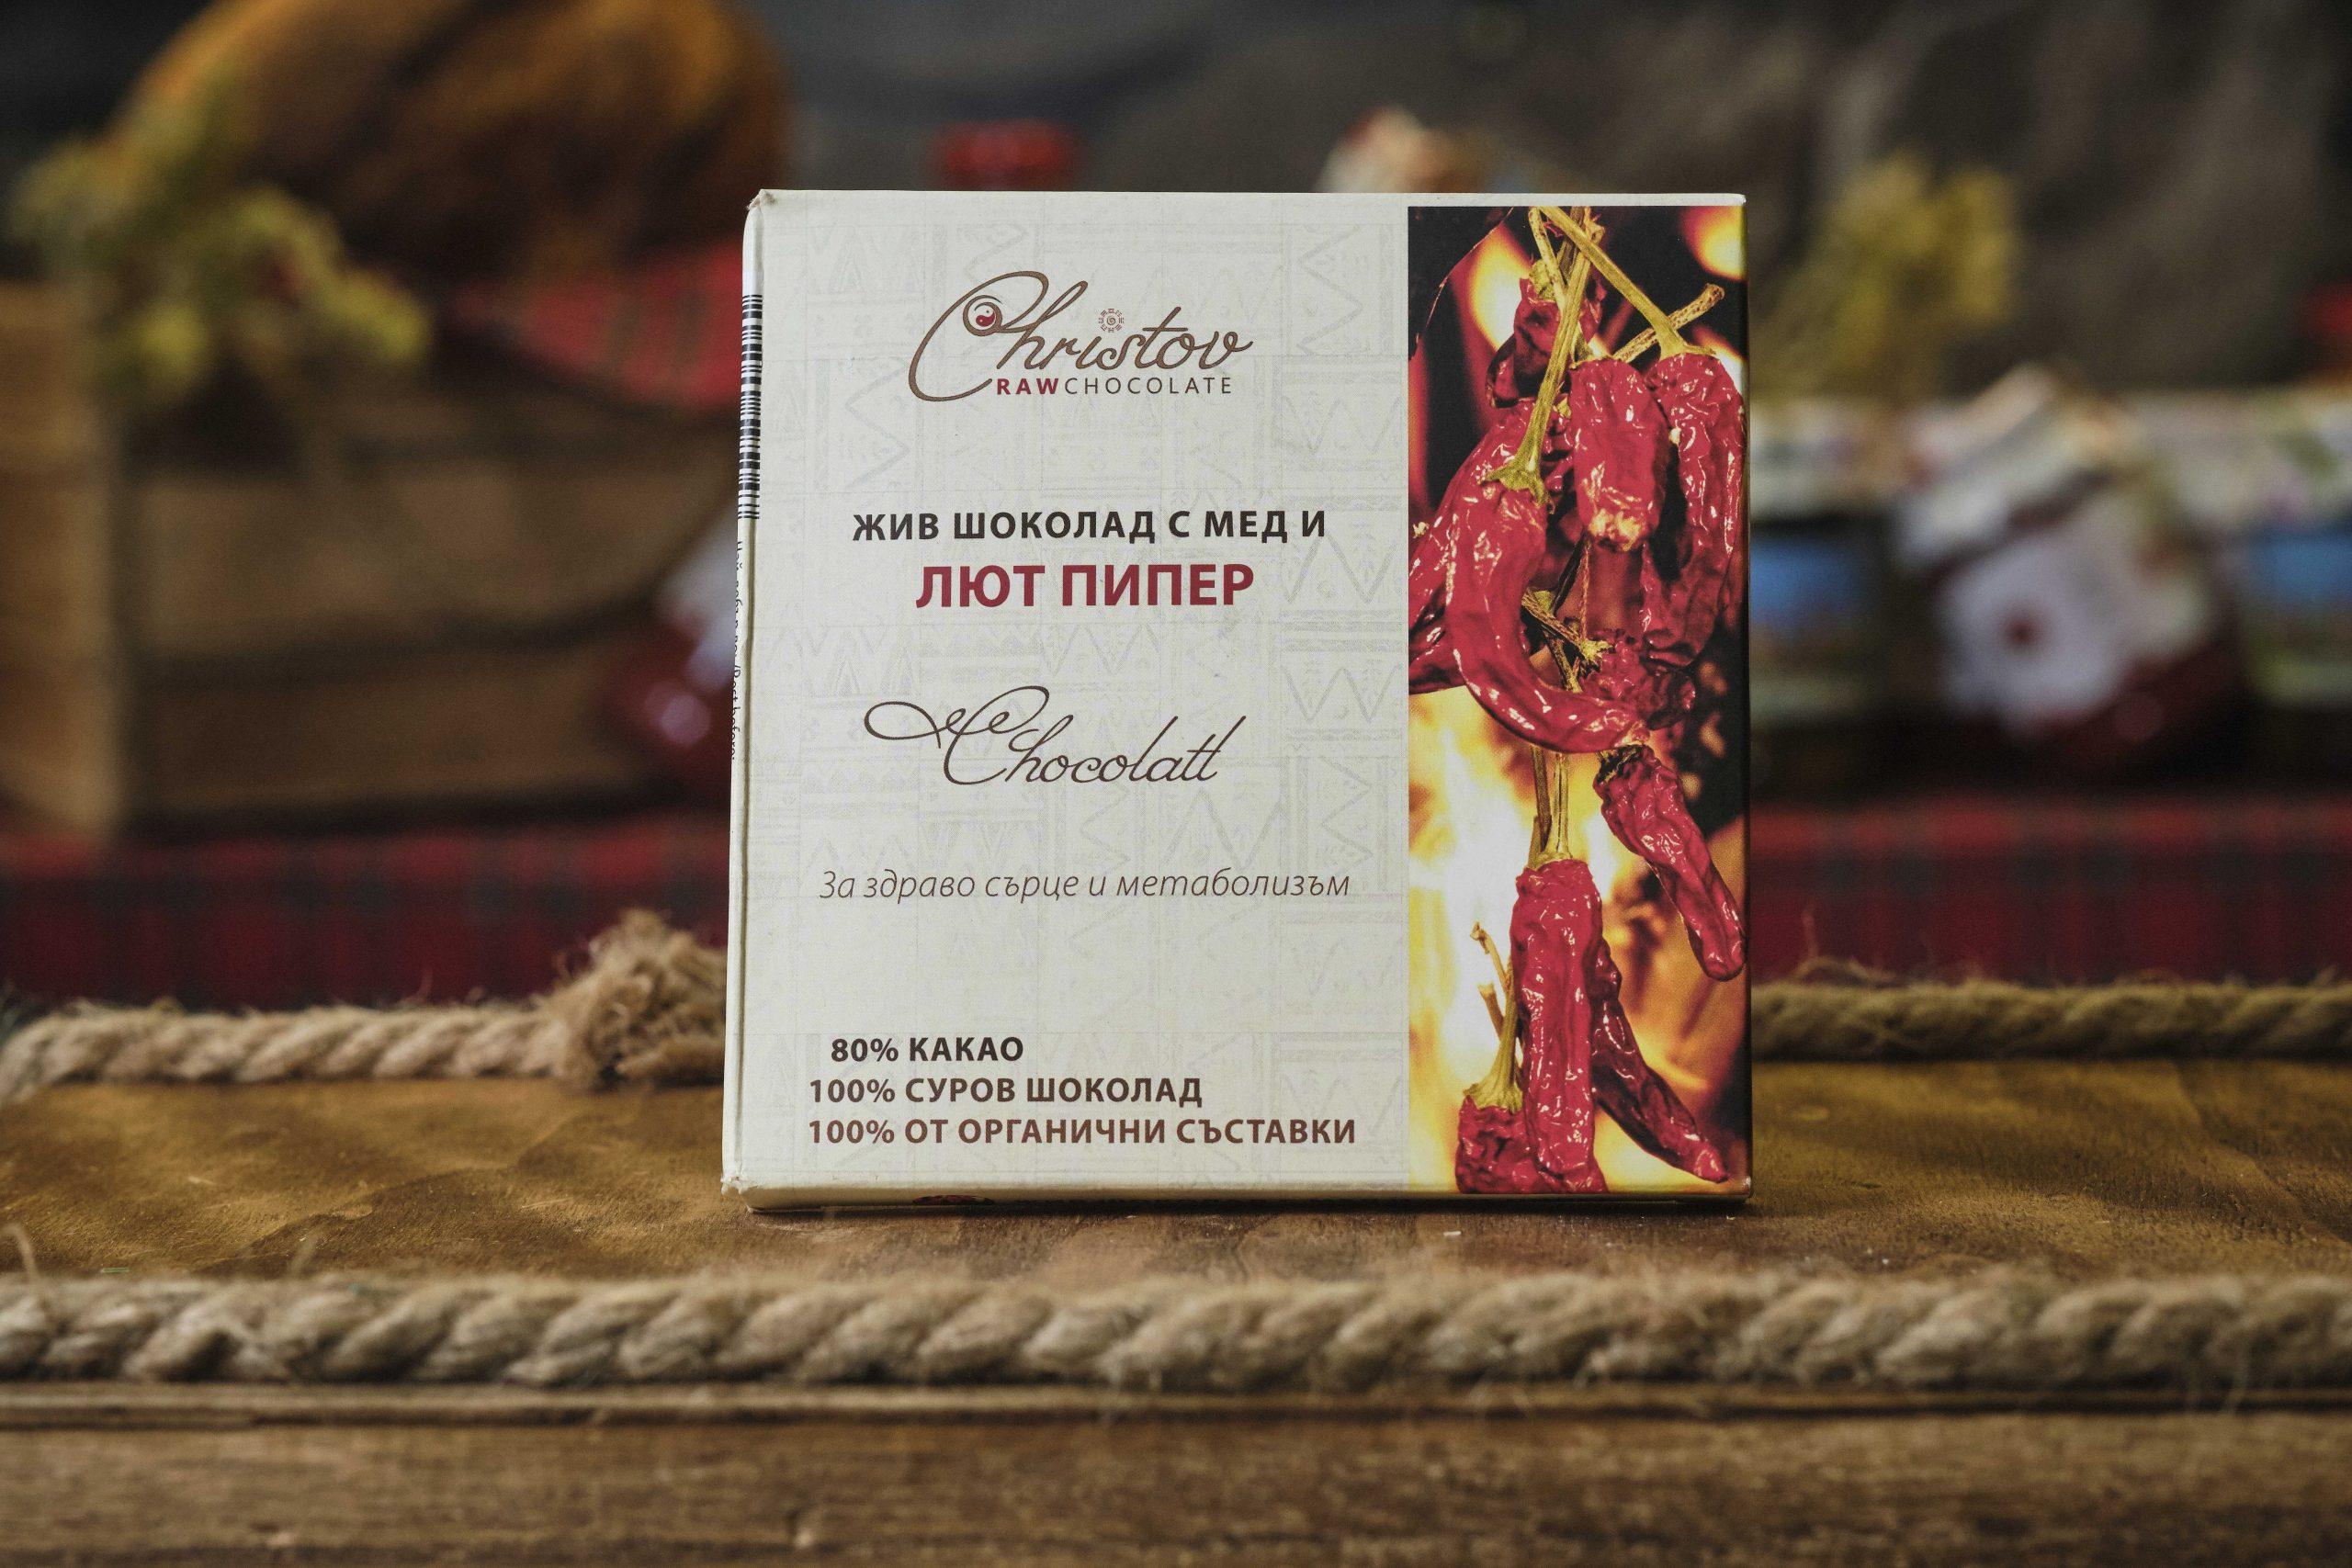 Лют пипер, Люта чушка (Chili pepper, Capsicum annuum cultivar) | Ботаника